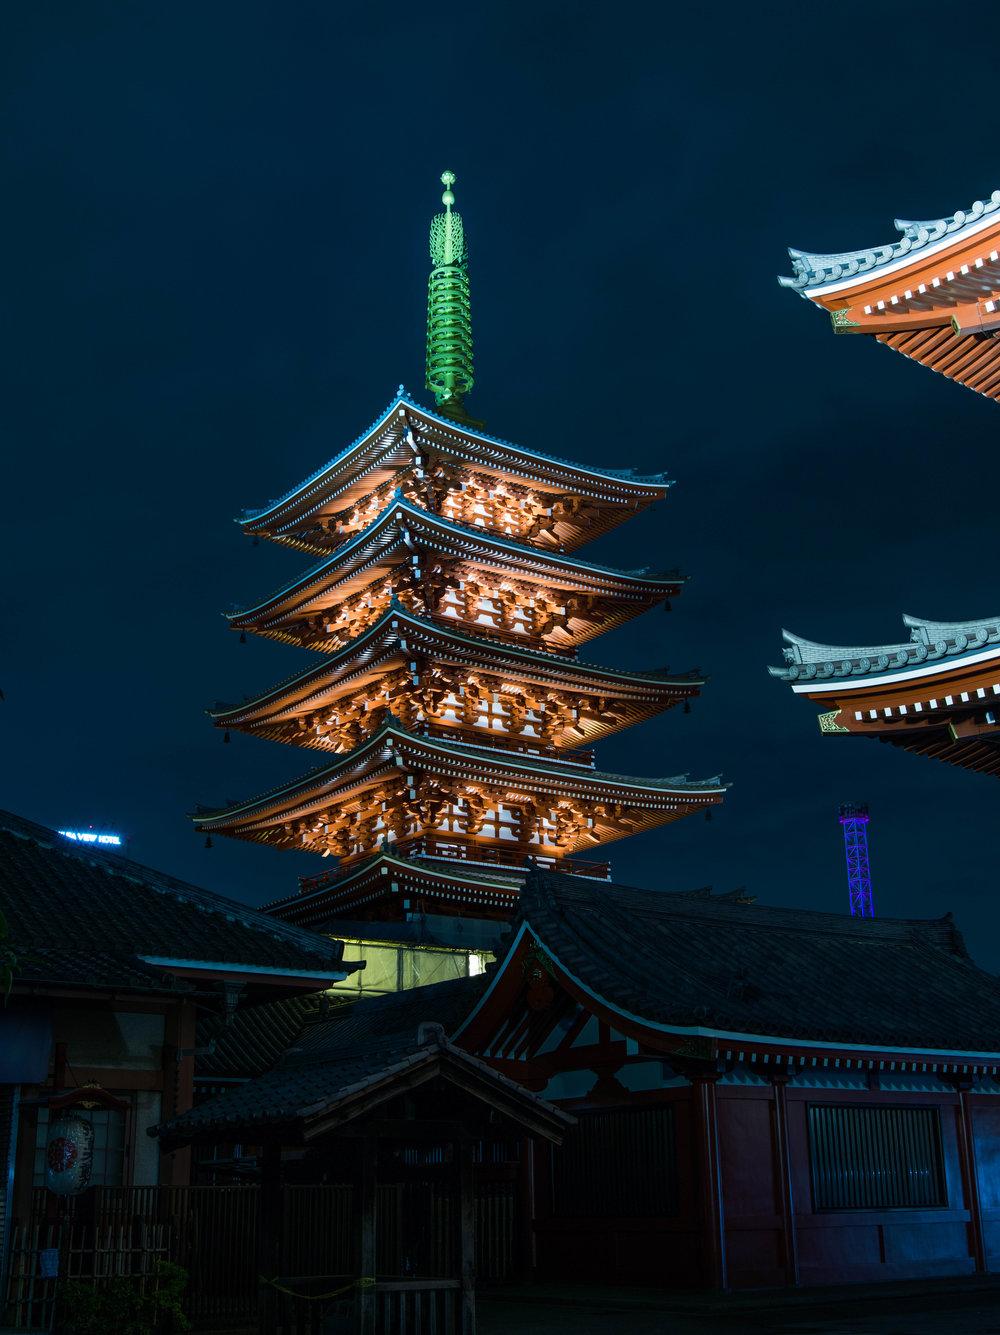 asakusa-street-photography_P640916.jpg